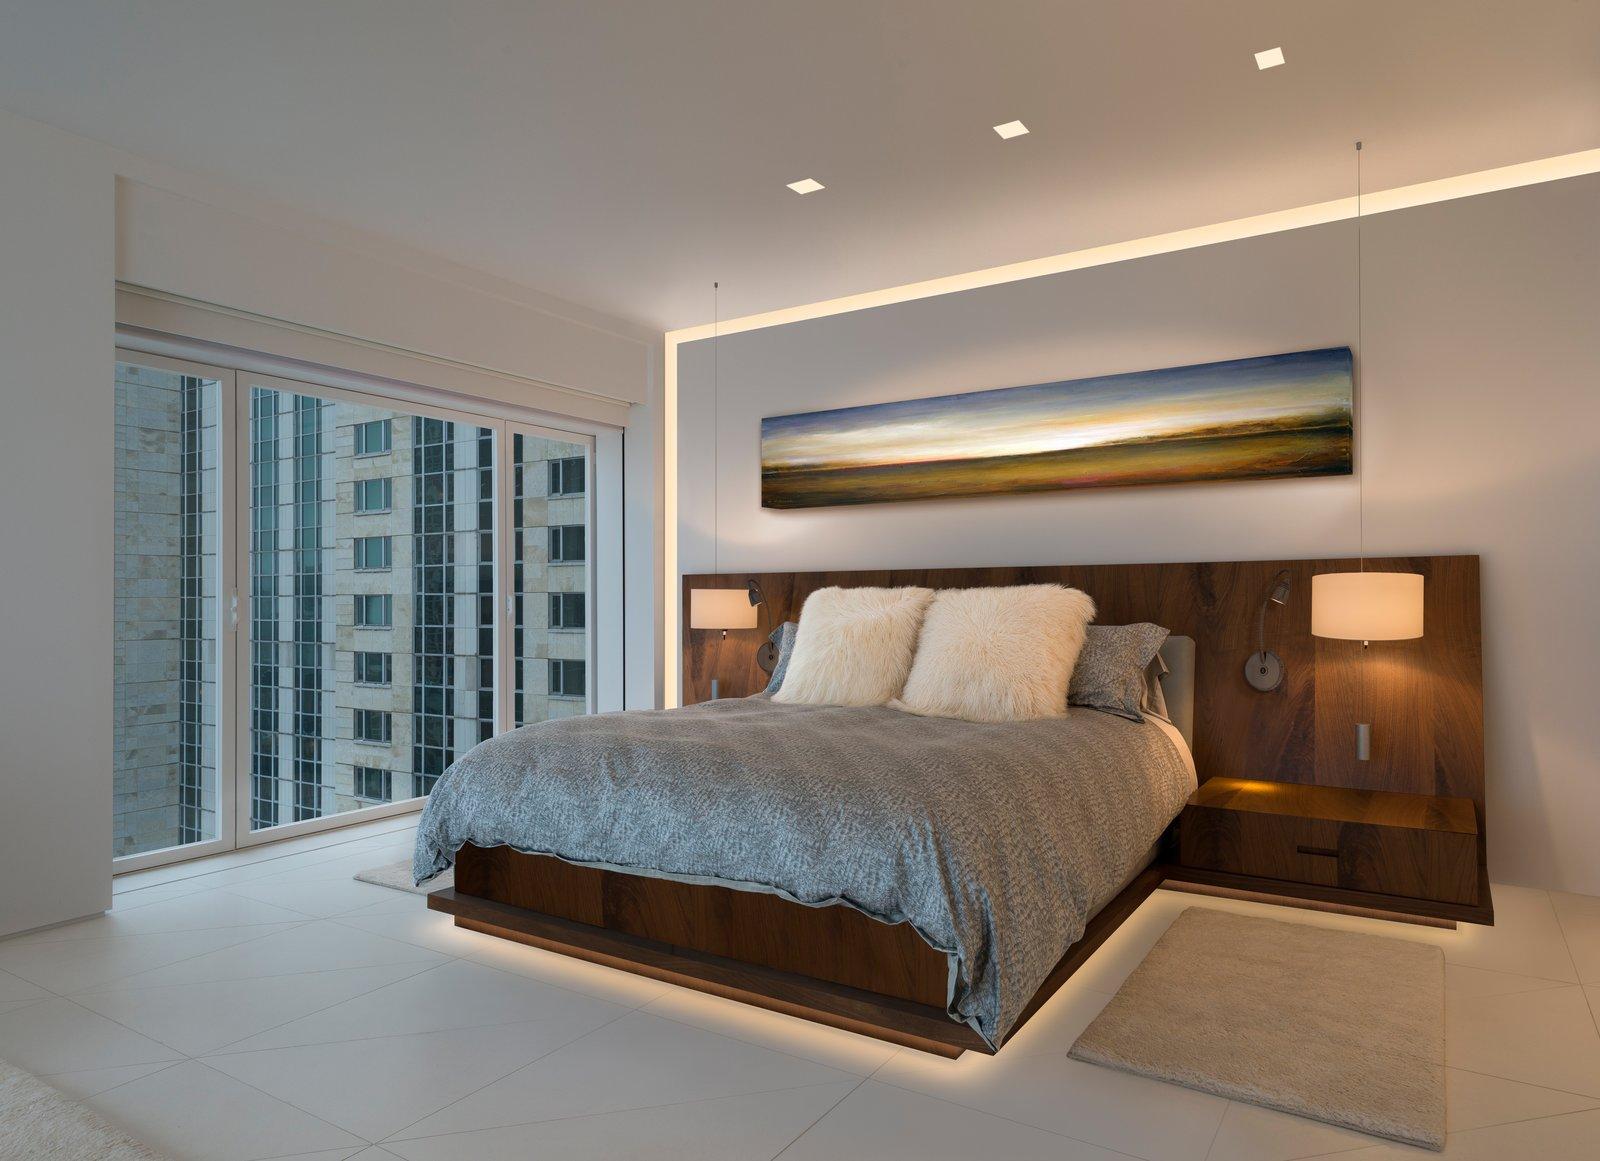 Verge LED system provides elegant and serene illumination   Bedroom